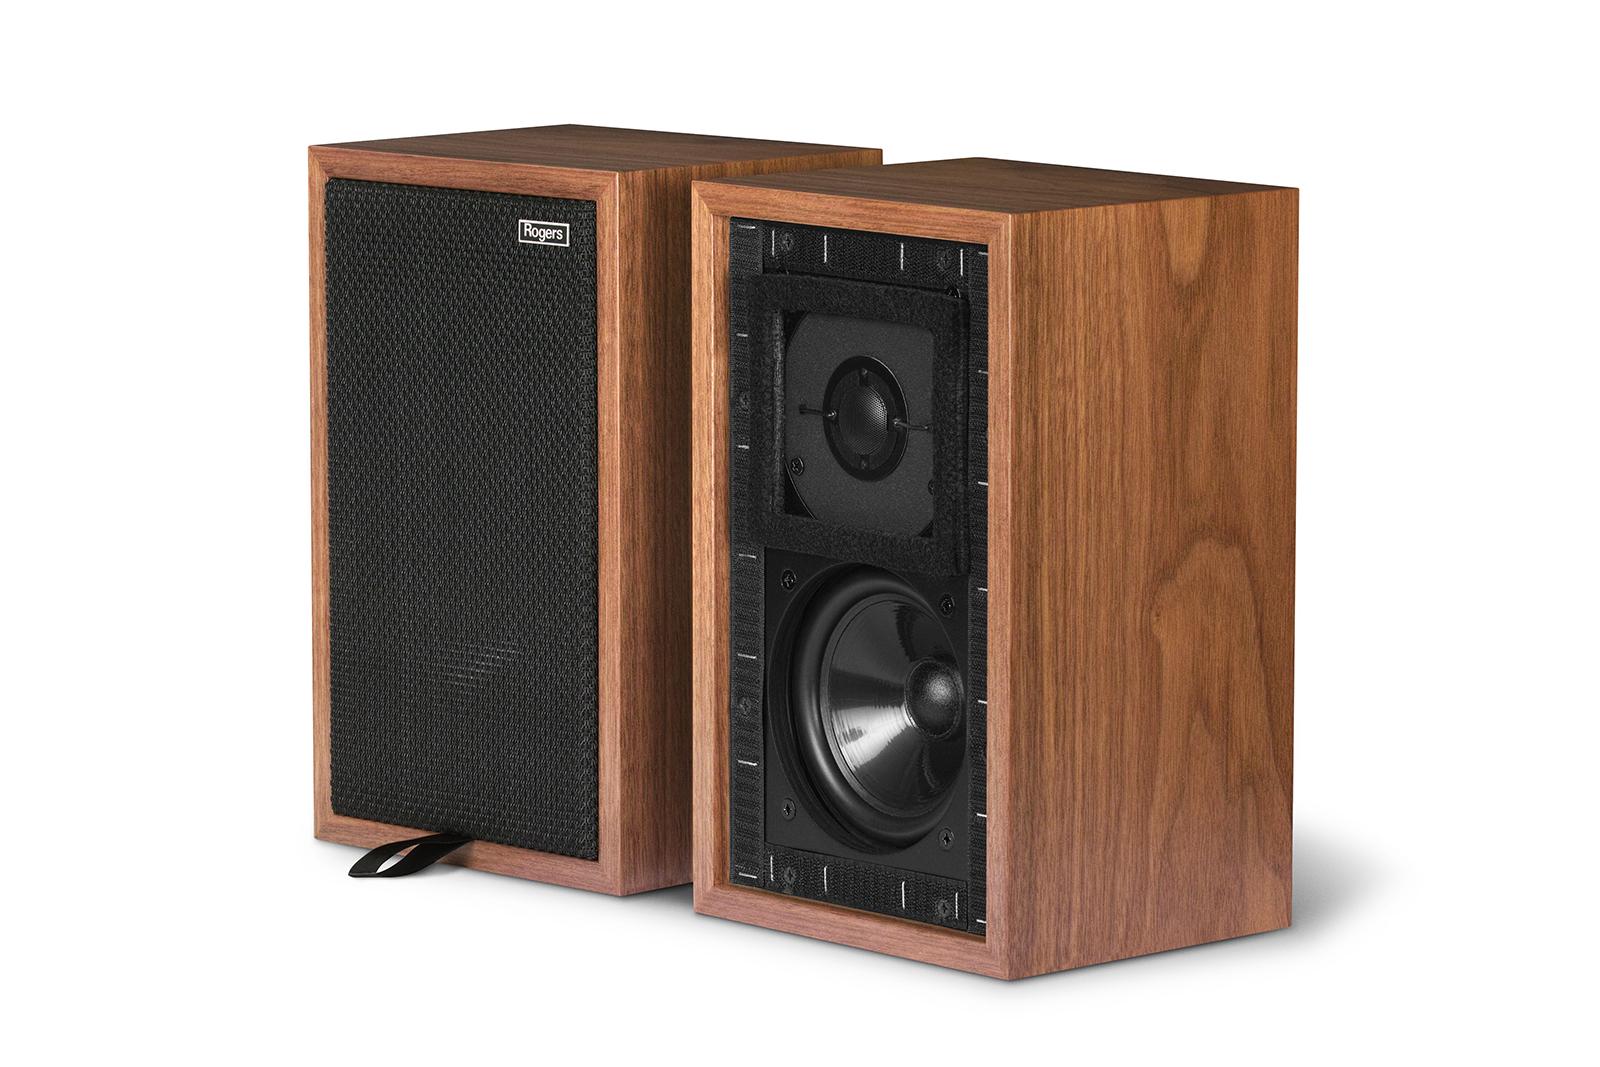 Rogers LS3/5a Classic 15 Ohm speakers